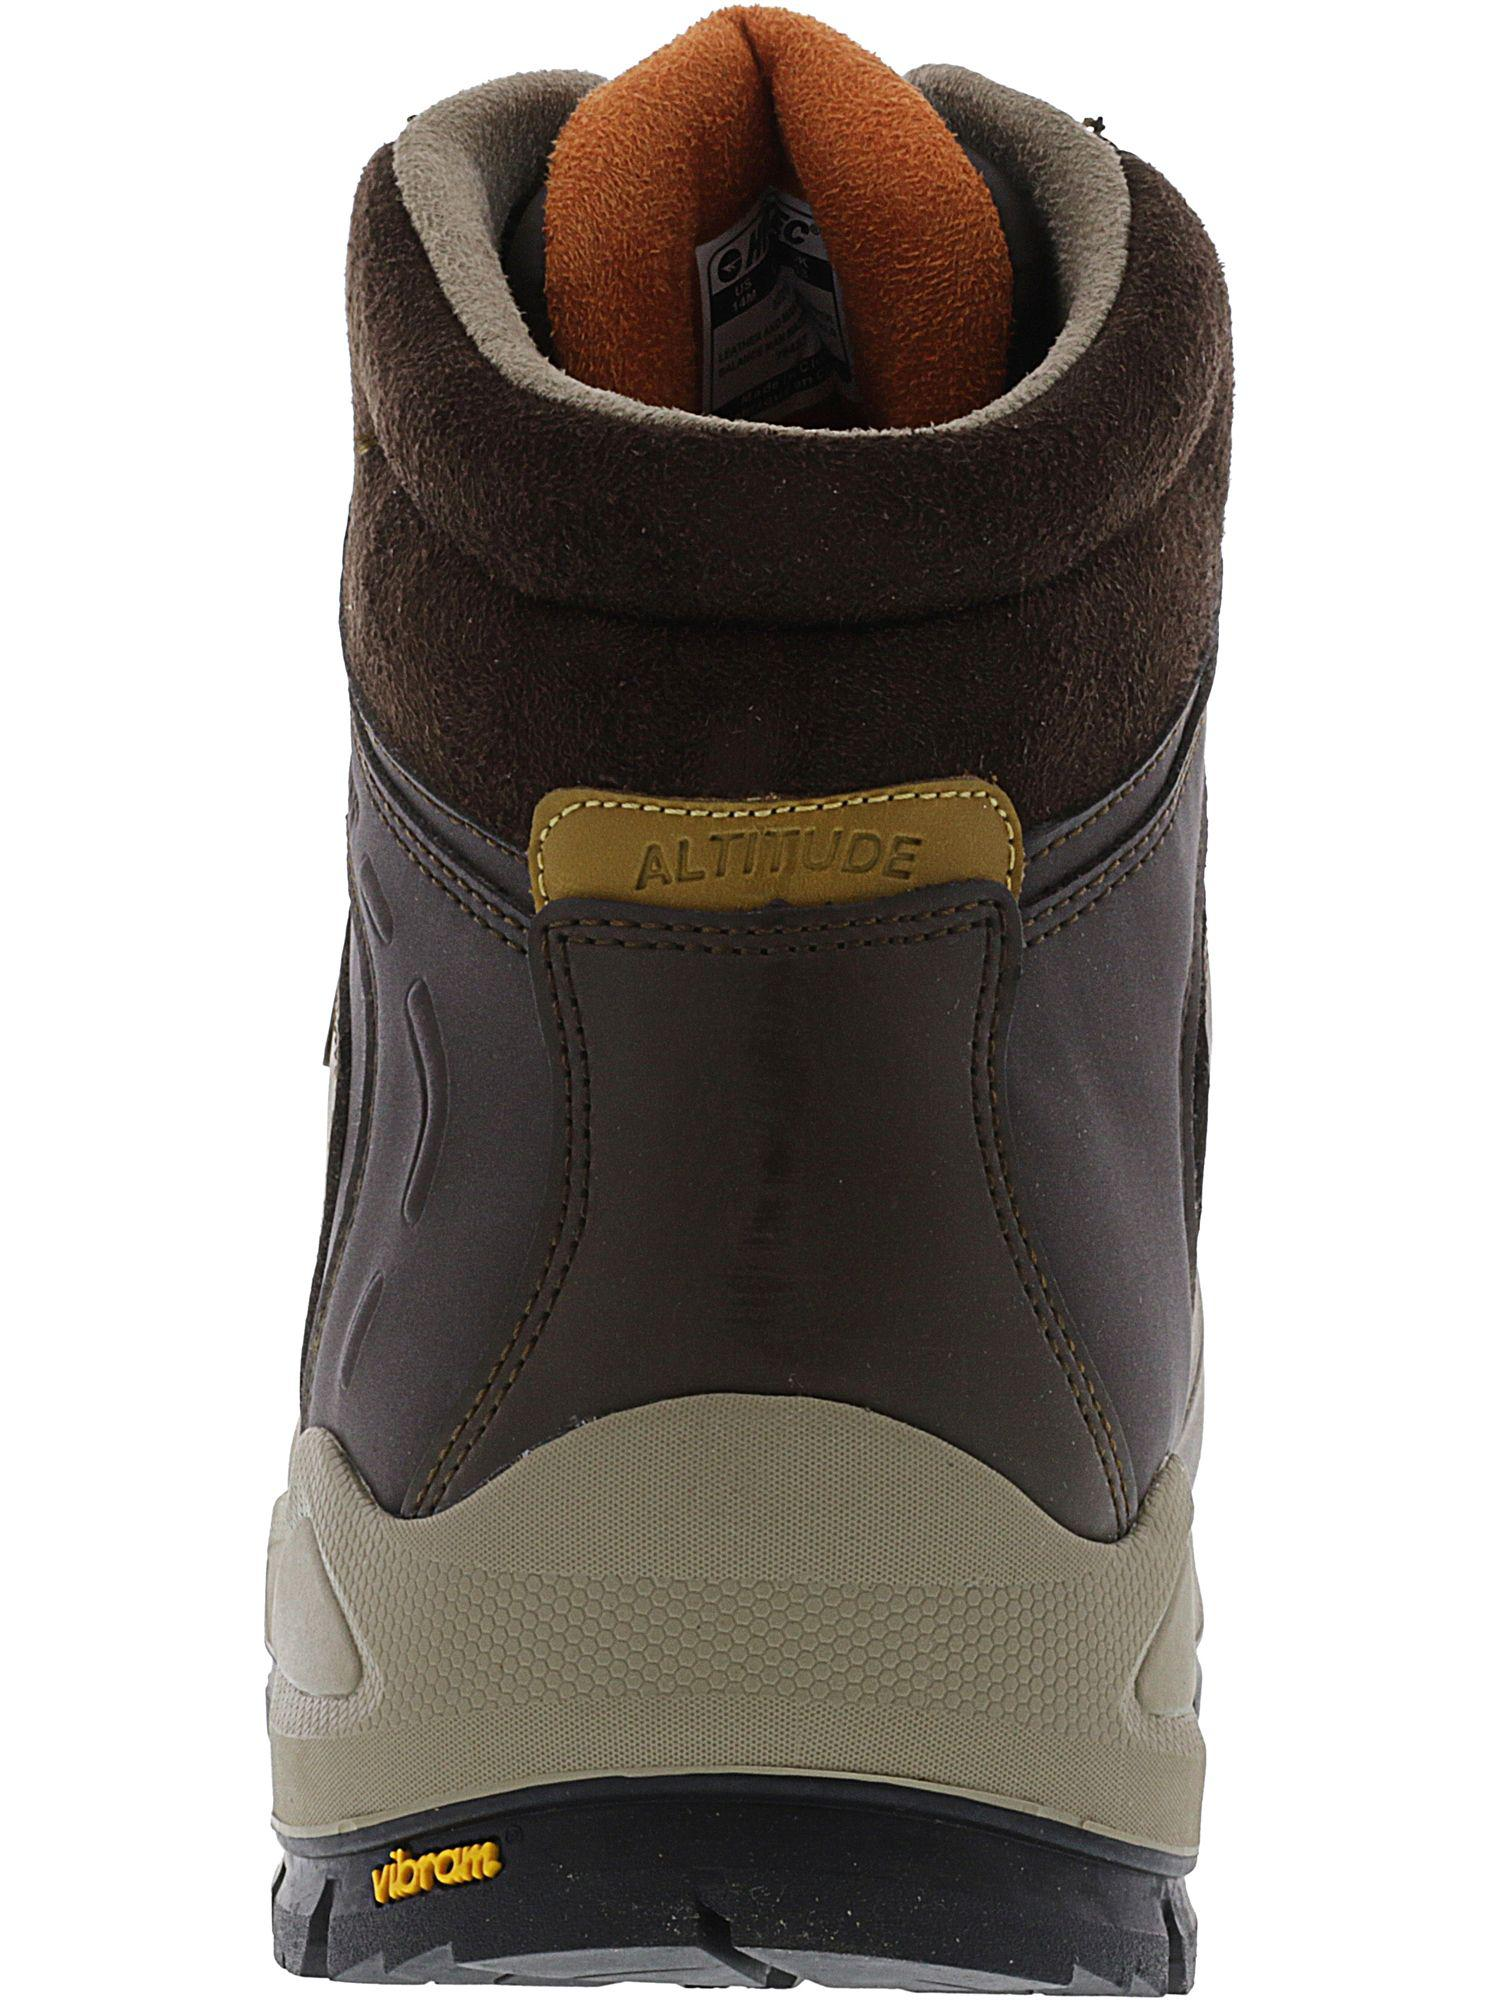 f48e9cce94f Hi-Tec Men's Altitude Alpyna Mid I Waterproof High-top Leather ...